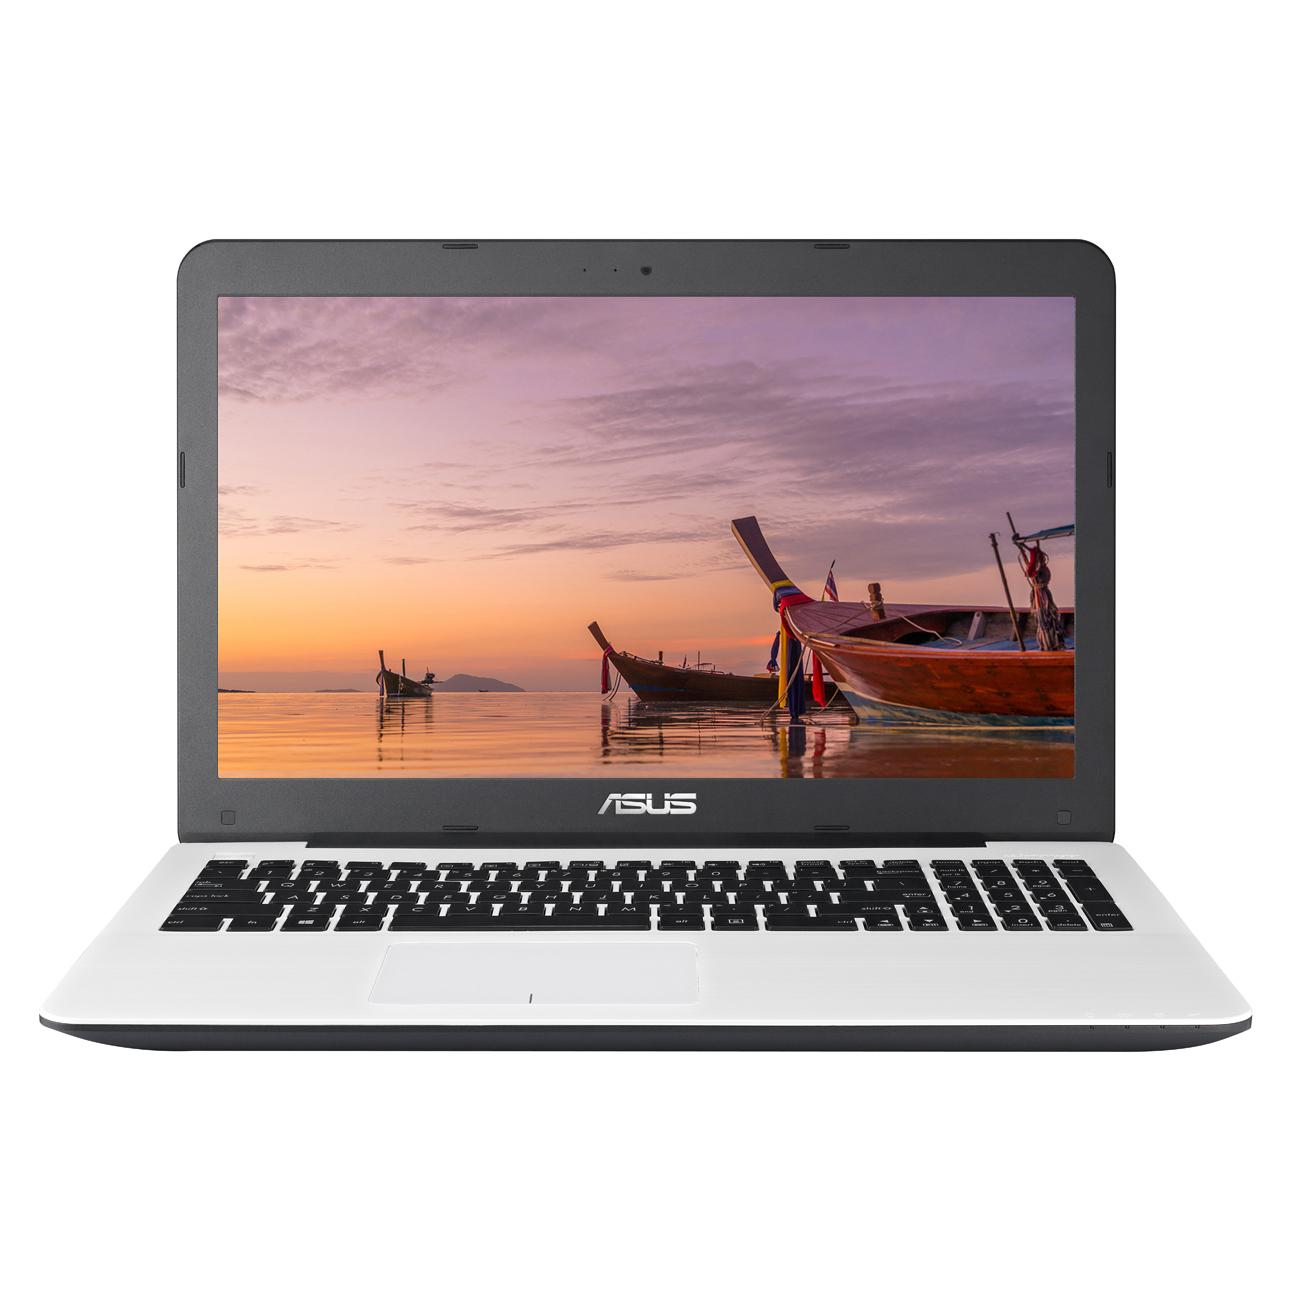 ASUS F554LA-XX2943 mit Intel Core i3, 8GB RAM, 256GB SSD und 15,6 Zoll HD für 329€ bei Notebooksbilliger